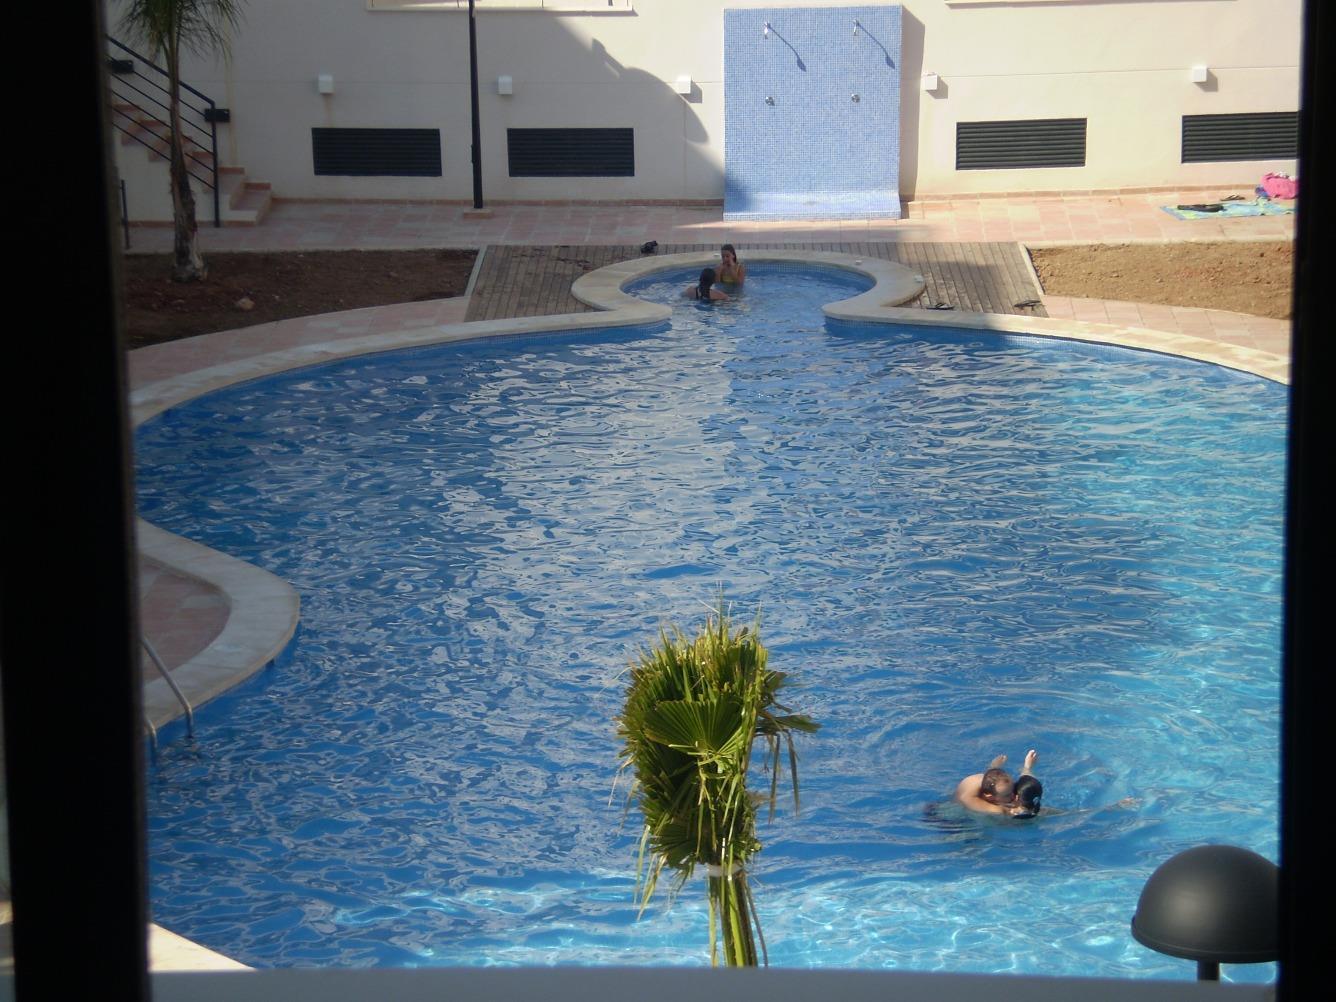 Lloguer Pis  Avenida del mar. Excelente apartamento en playa!!!!!!!!!!!!!!!!!!